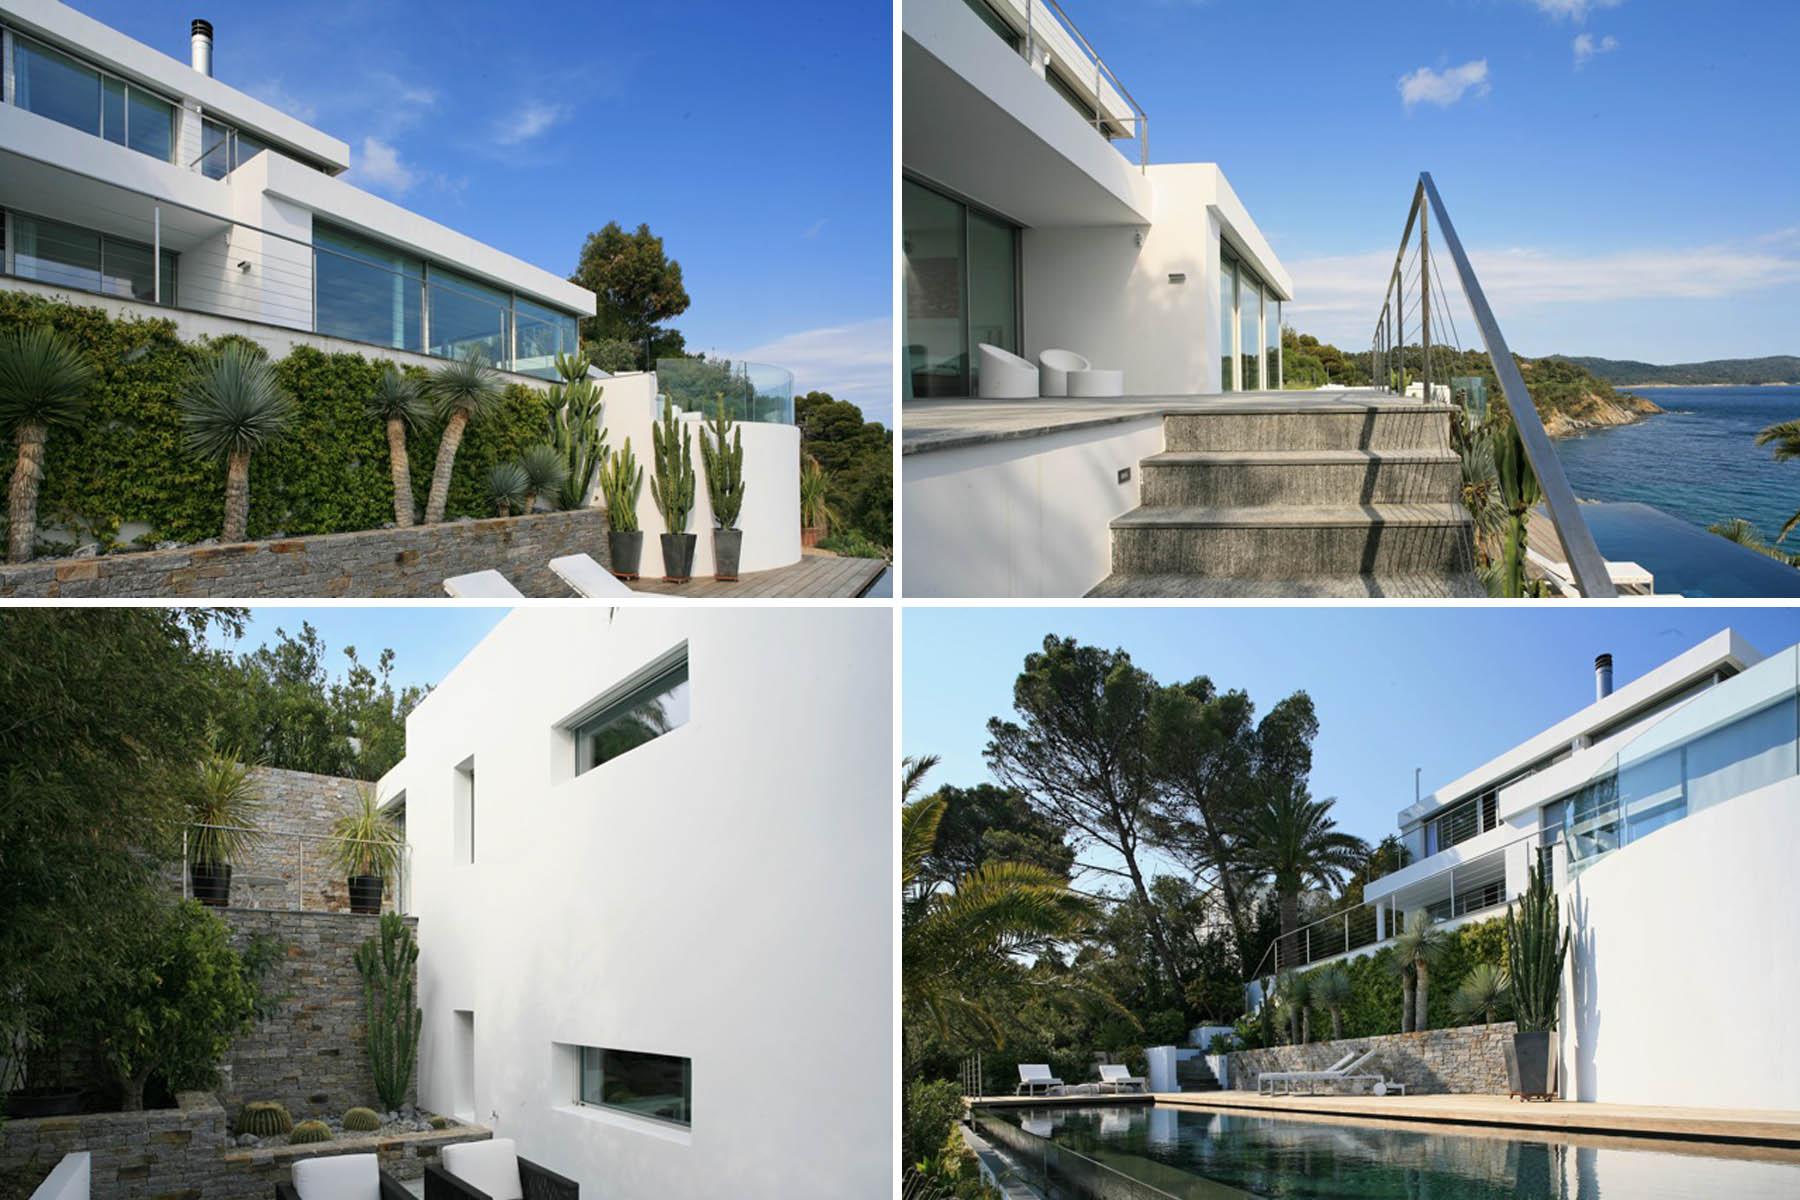 G1_Florence_Watine_Architecte_Designer_Decoratrice_Paris_France_Villa_Moderne